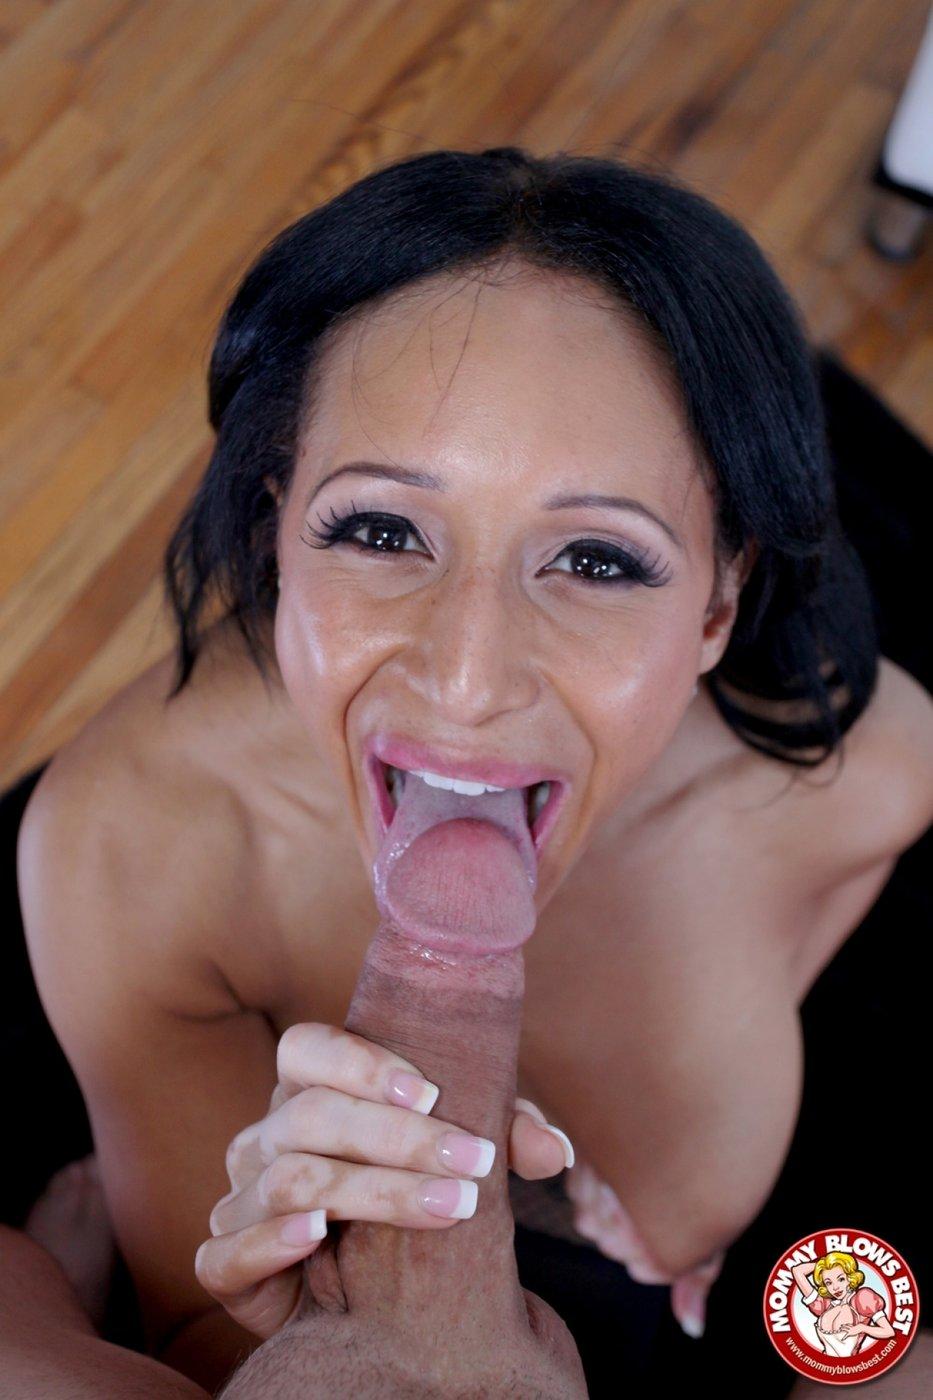 Hairy latina creampie